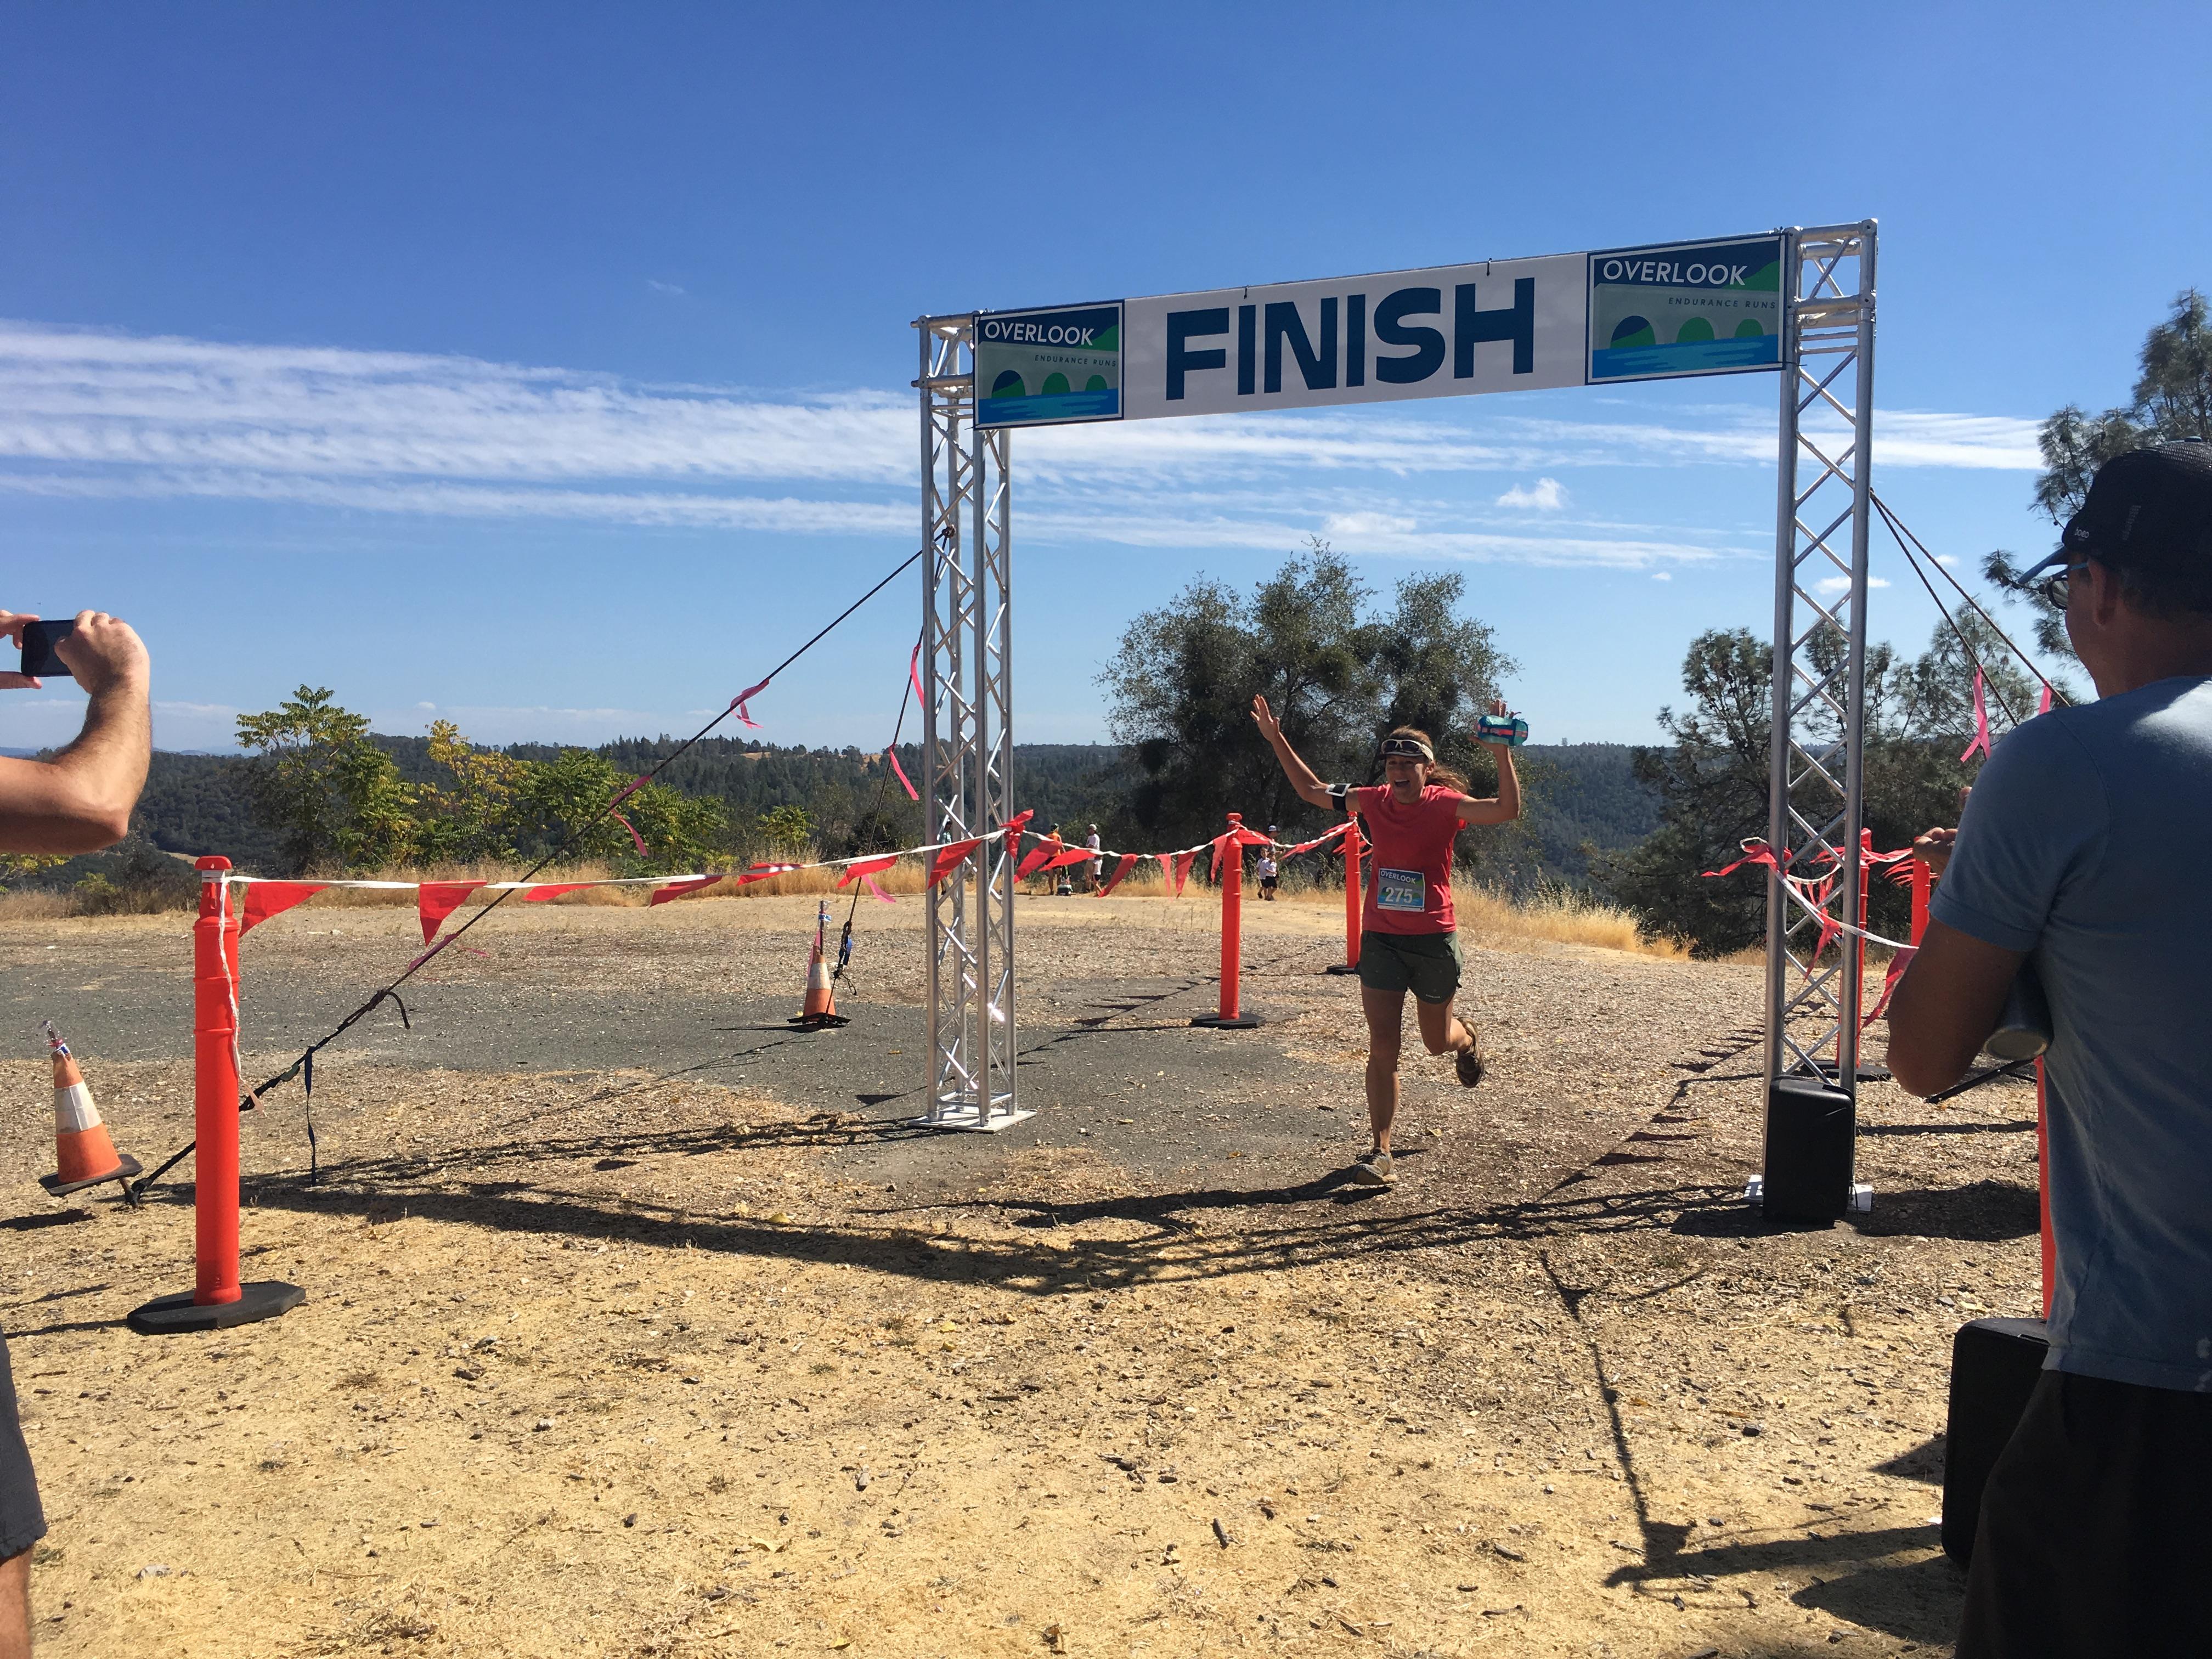 ultramarathon overlook